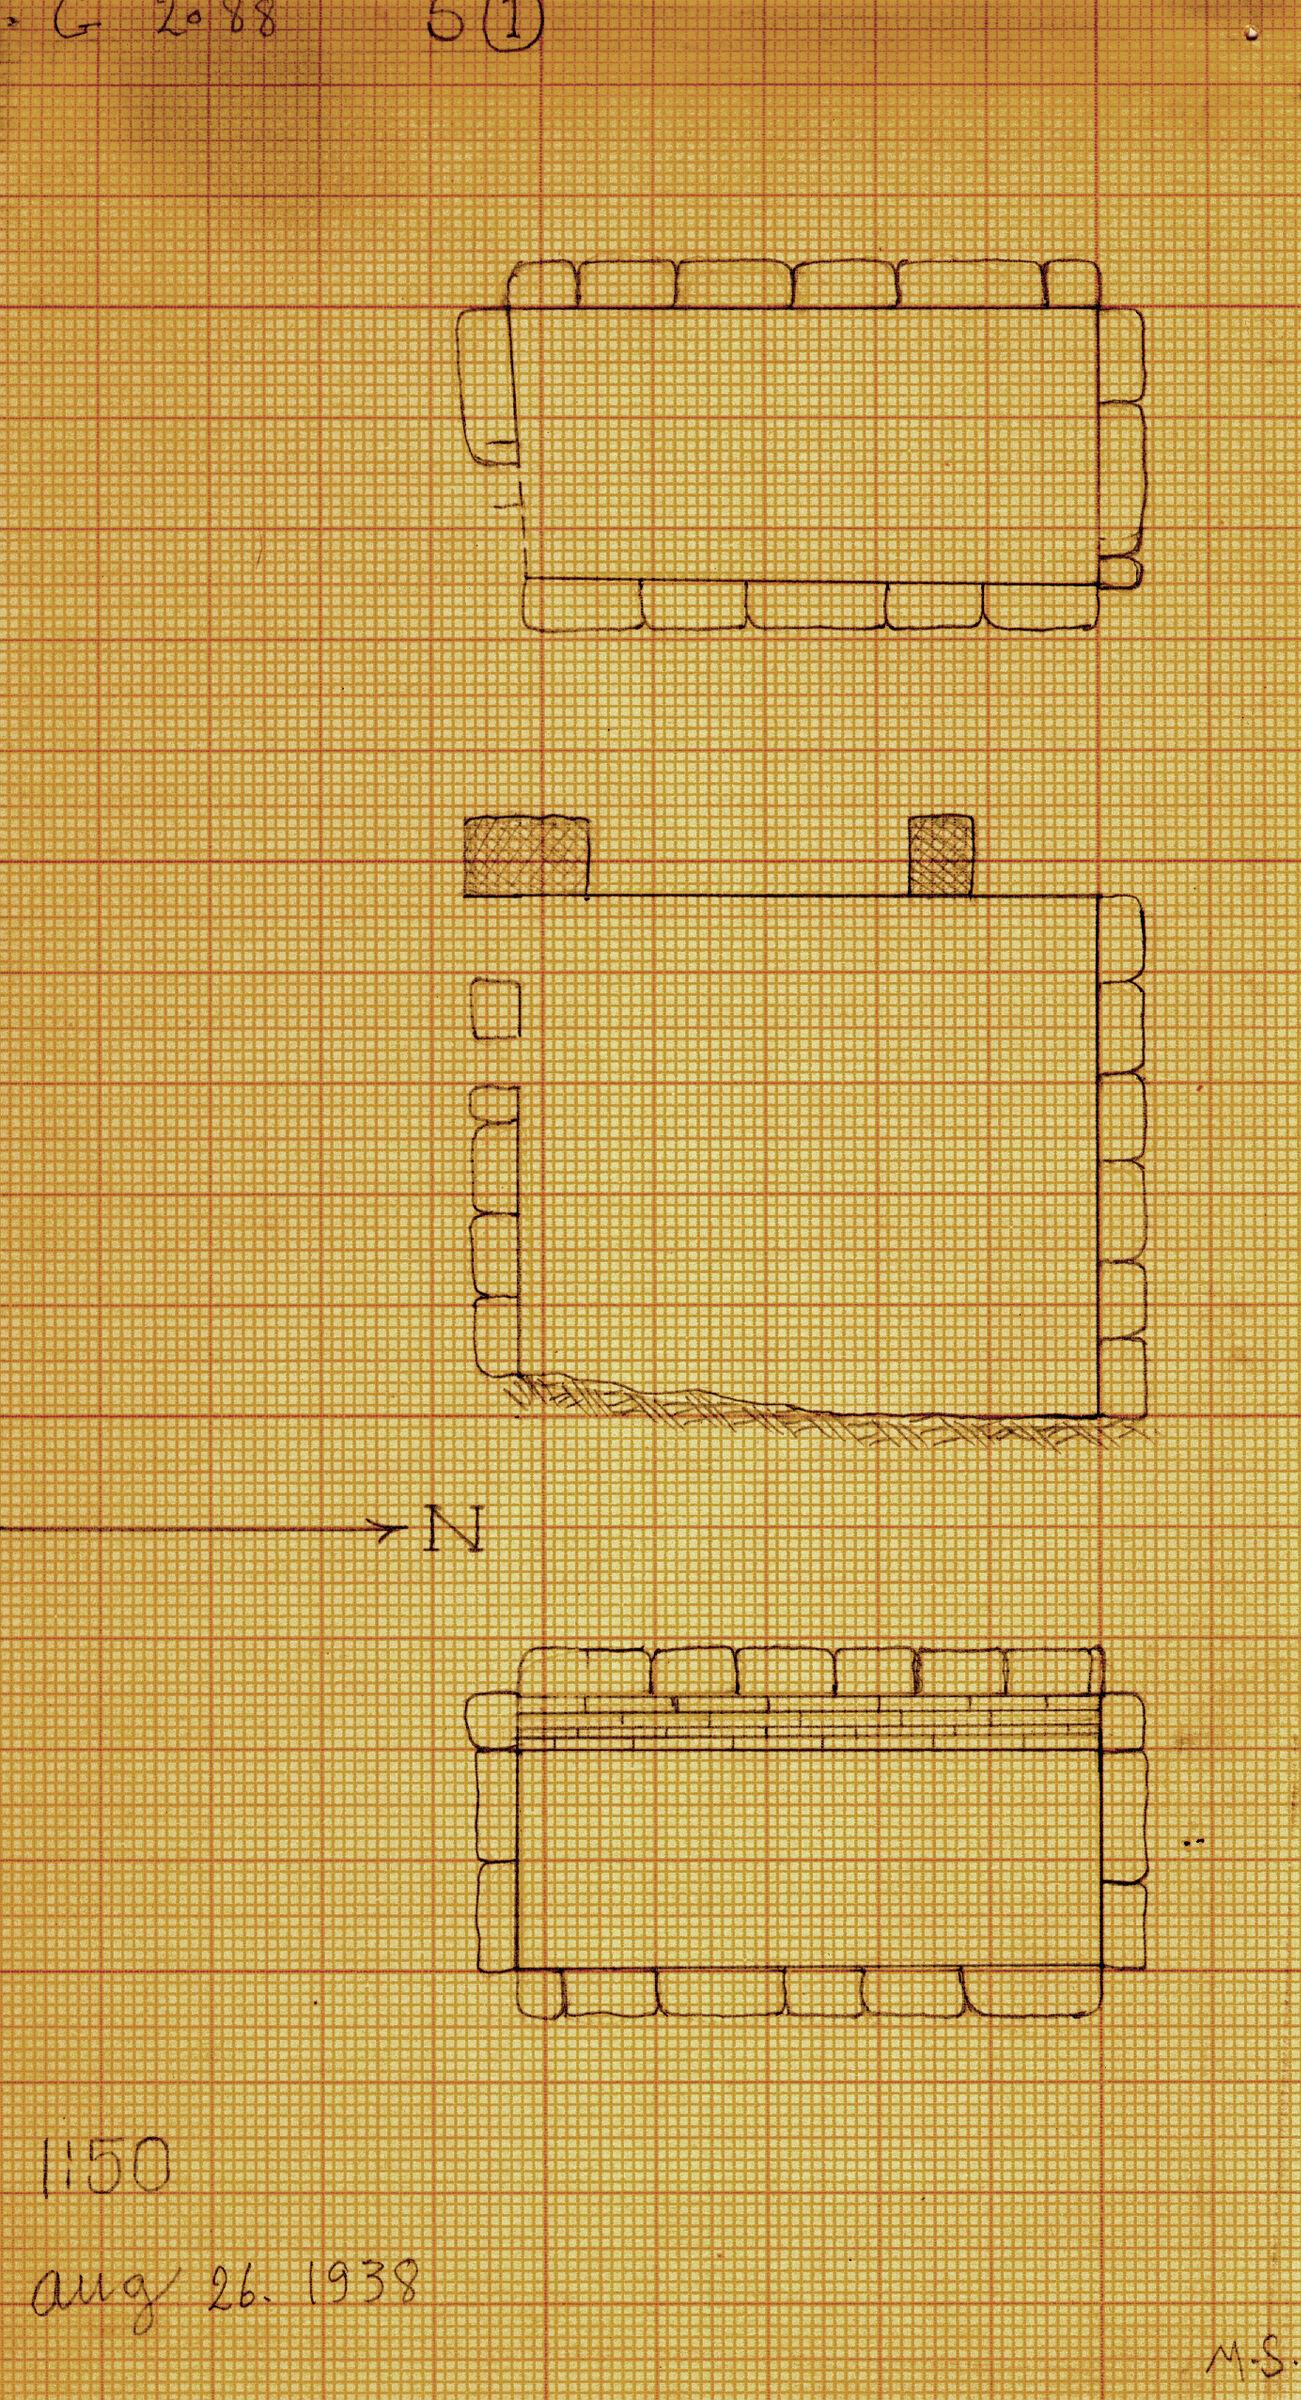 Maps and plans: G 2088, Serdab 1